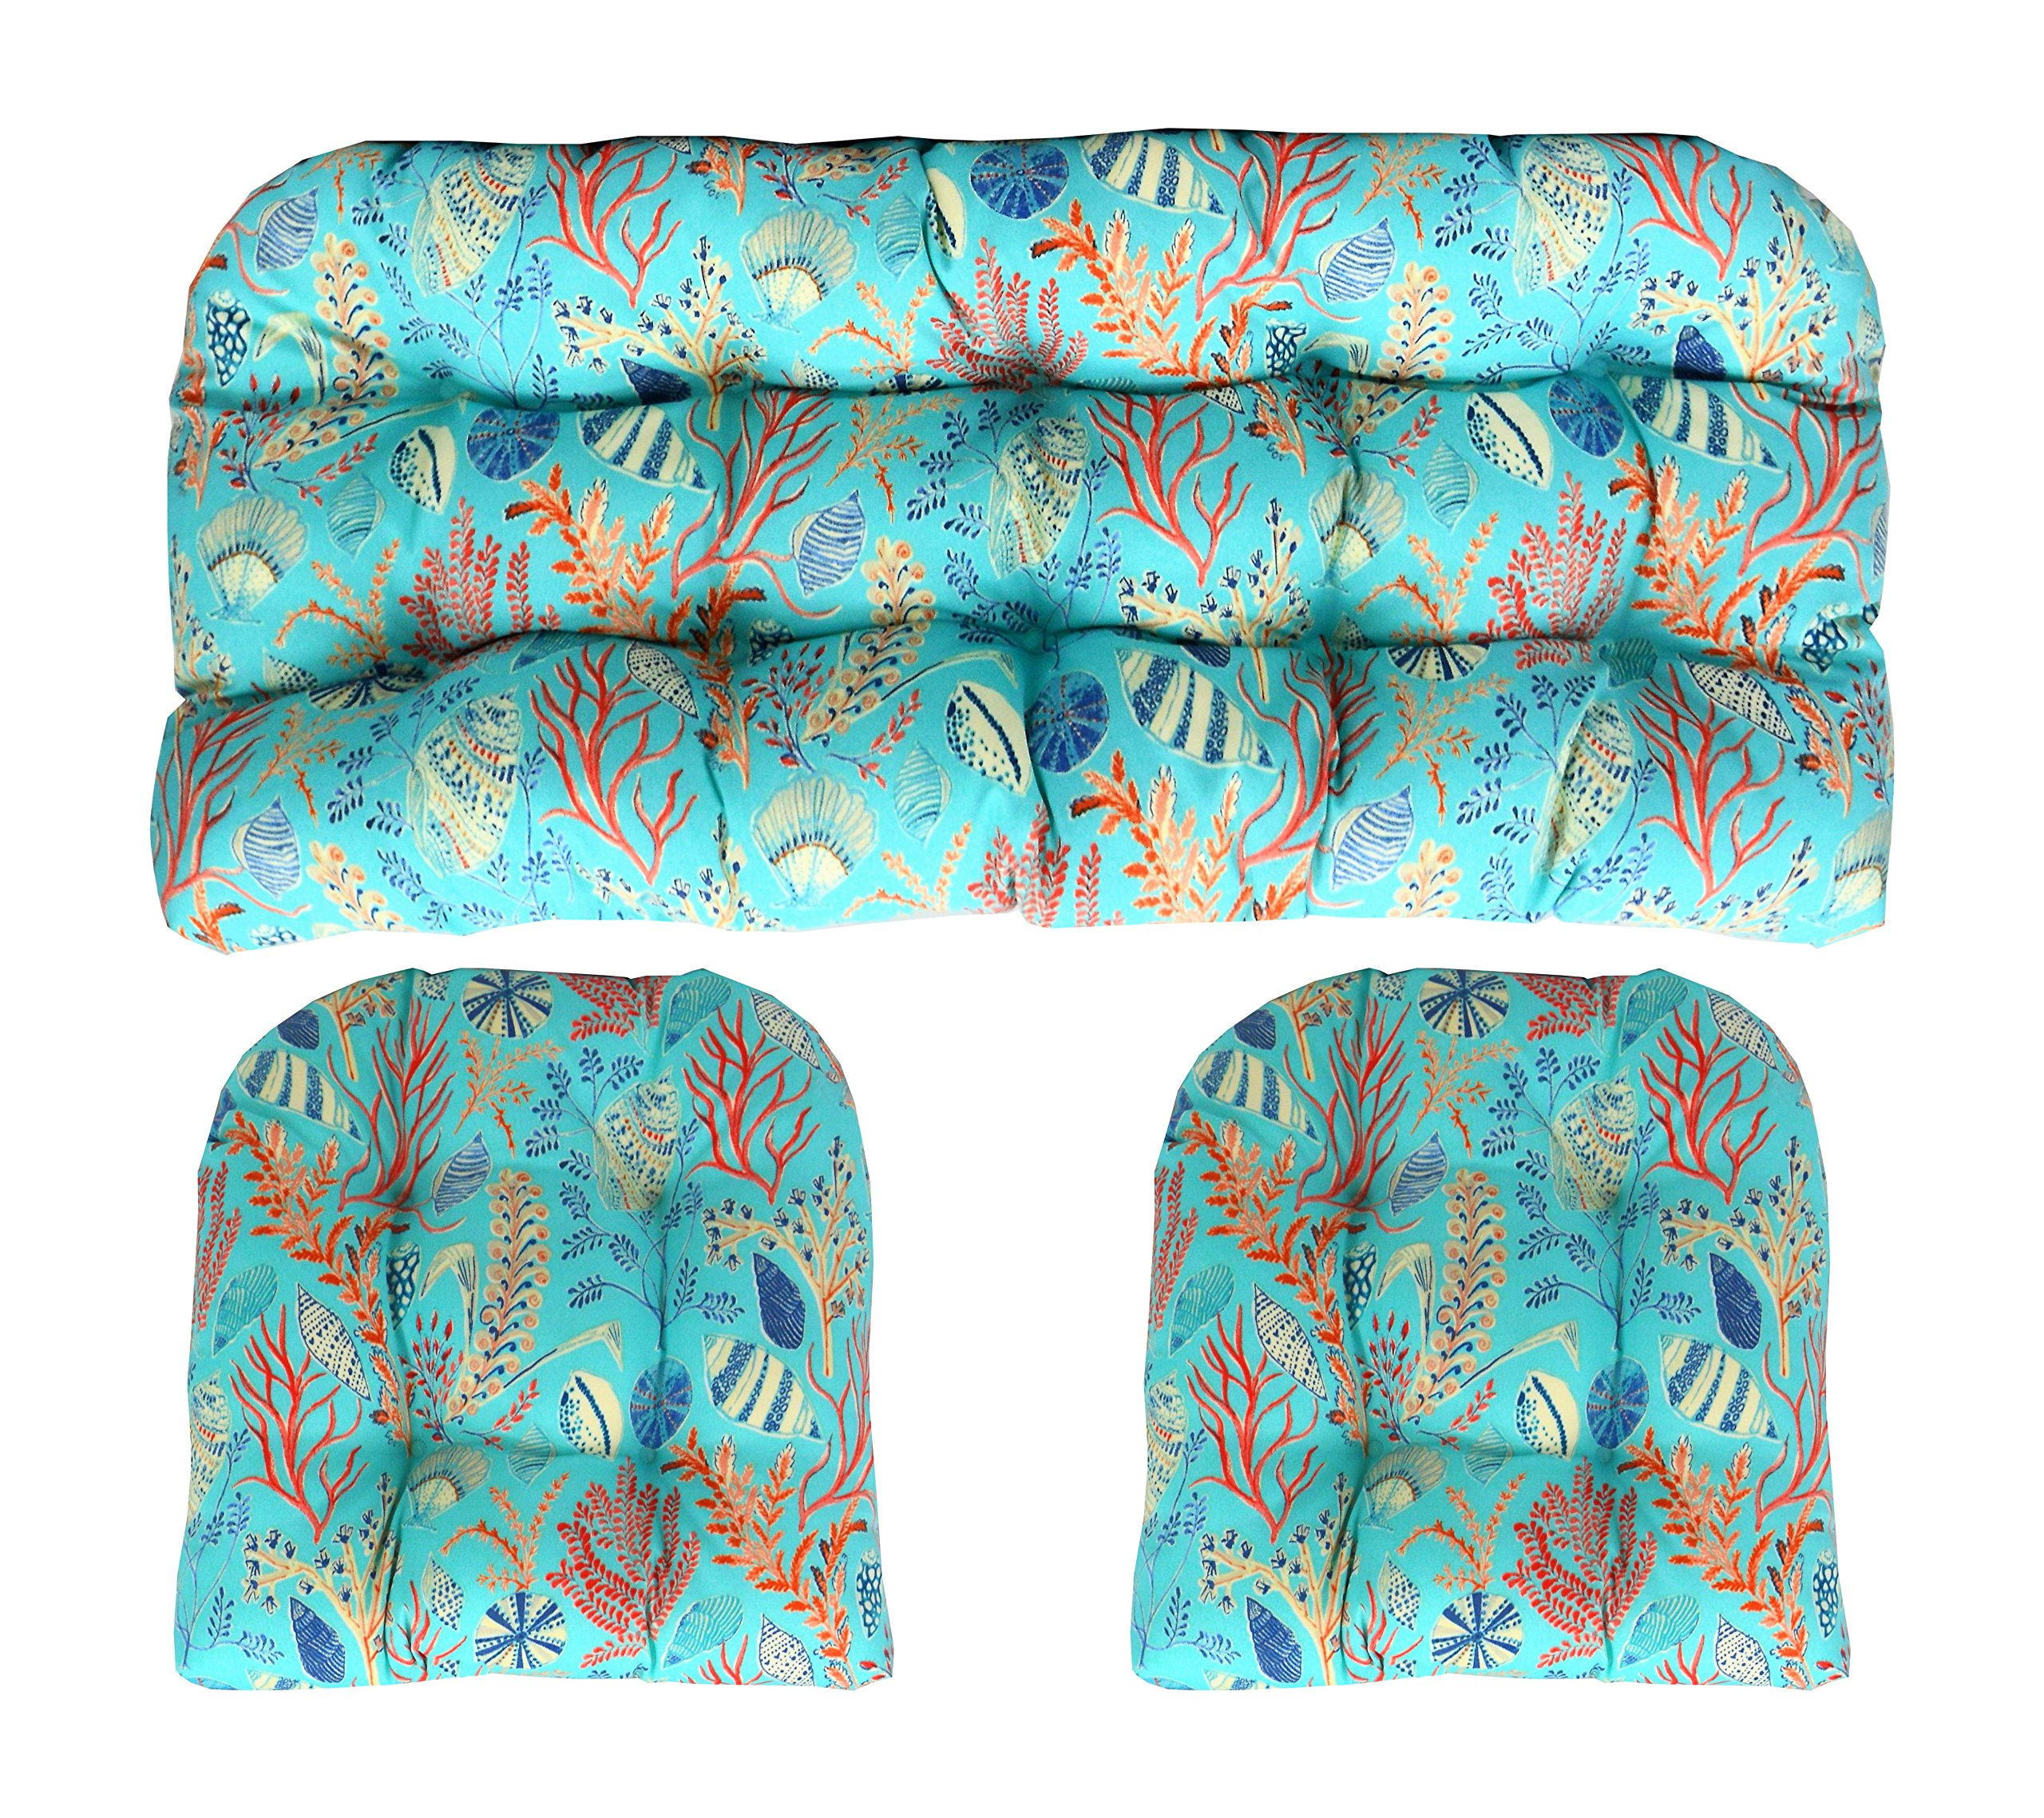 RSH Decor Indoor Outdoor 3 Piece Wicker Tufted Cushion Piece Set ~ Blue, Peach, White, Cream, Orange, Coral, Red ~ Ocean Life ~ Coastal ~ Coral Reef by RSH Decor